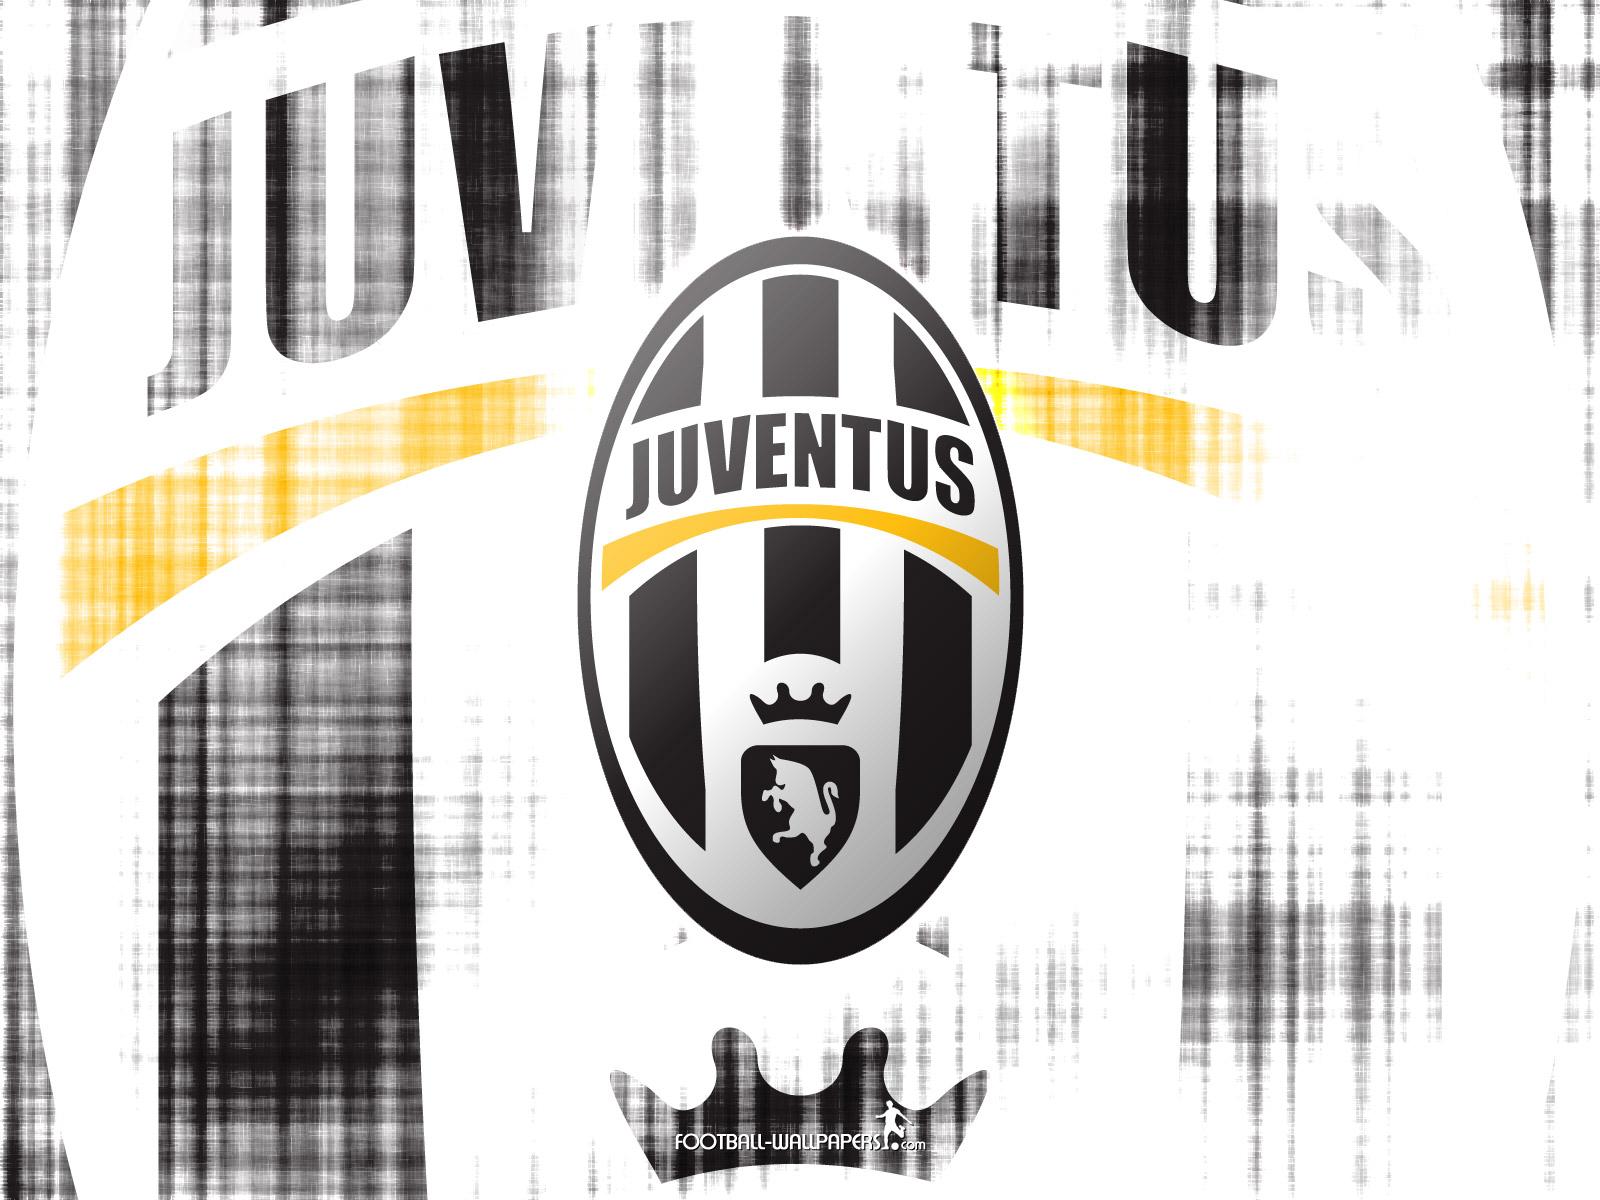 http://3.bp.blogspot.com/-RNxw2OlkX5s/ThhauVacsKI/AAAAAAAAA14/h084gYTT82I/s1600/Juventus+Wallpaper+2011.jpg